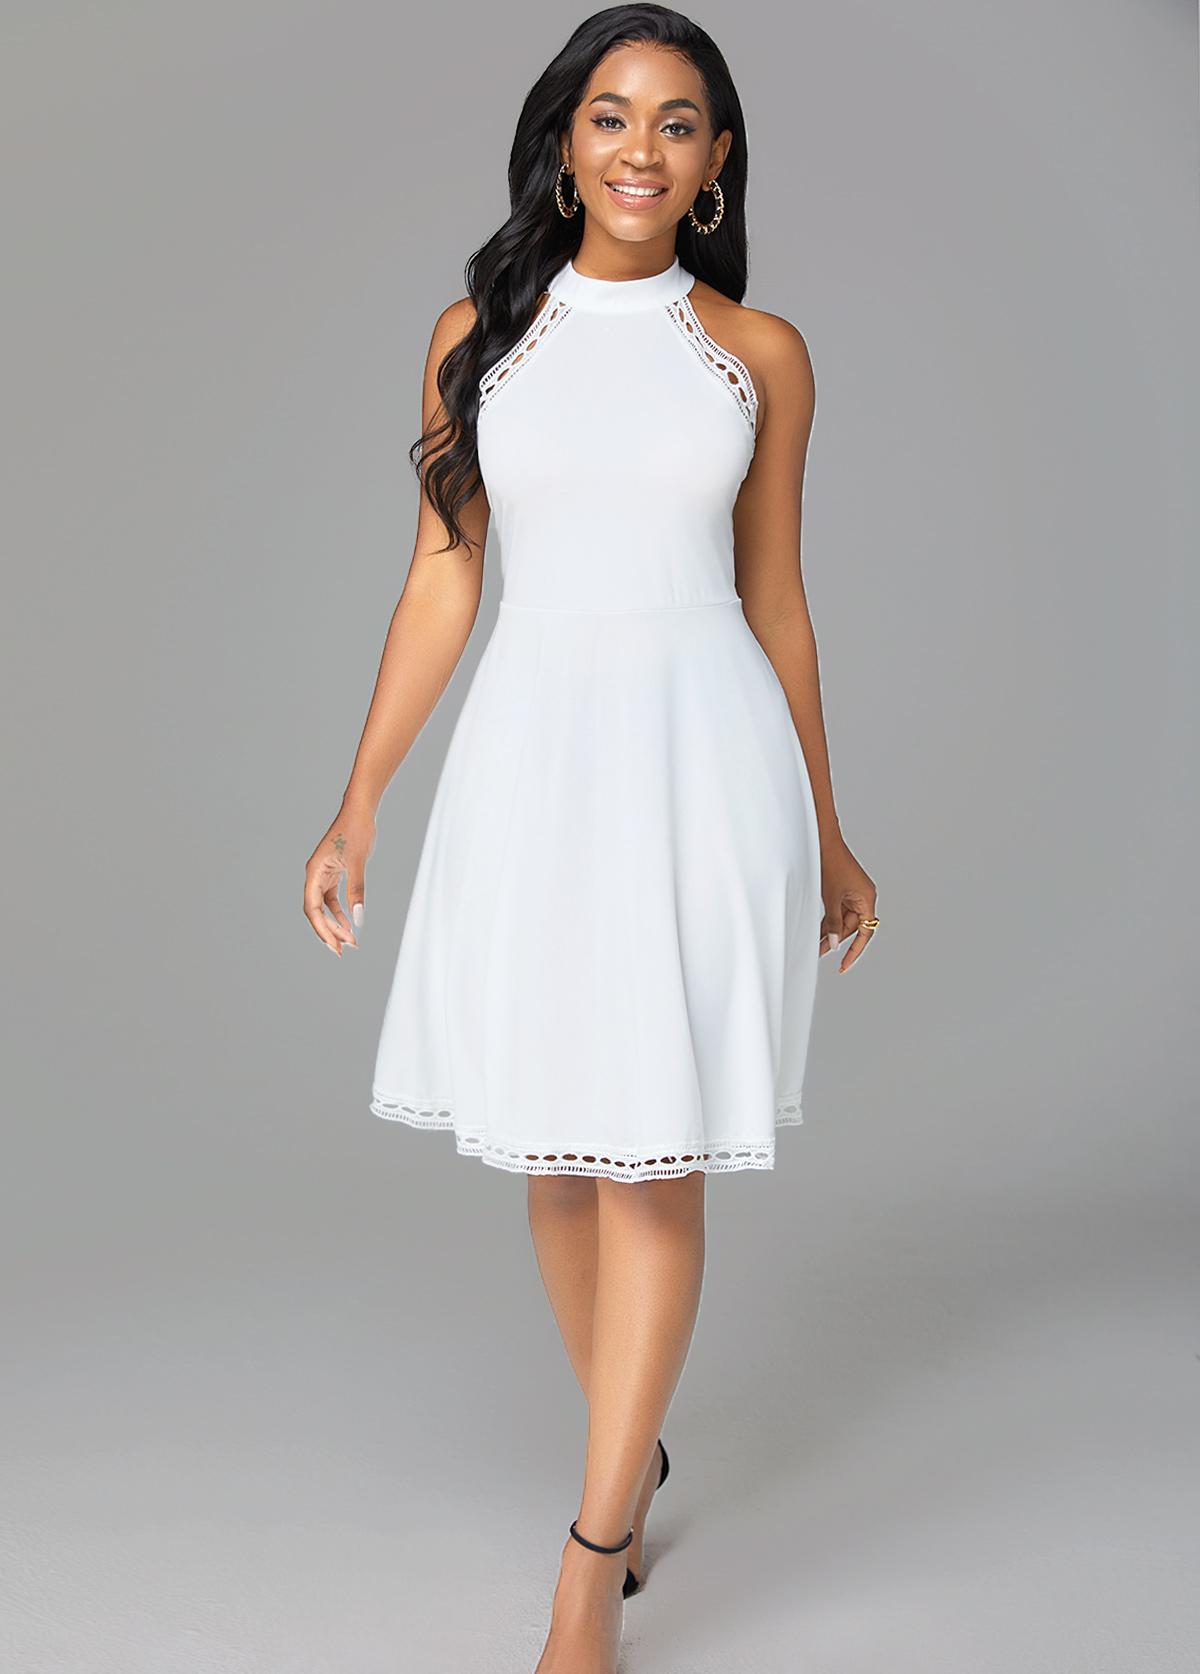 Sleeveless Pierced Mock Neck Solid Dress